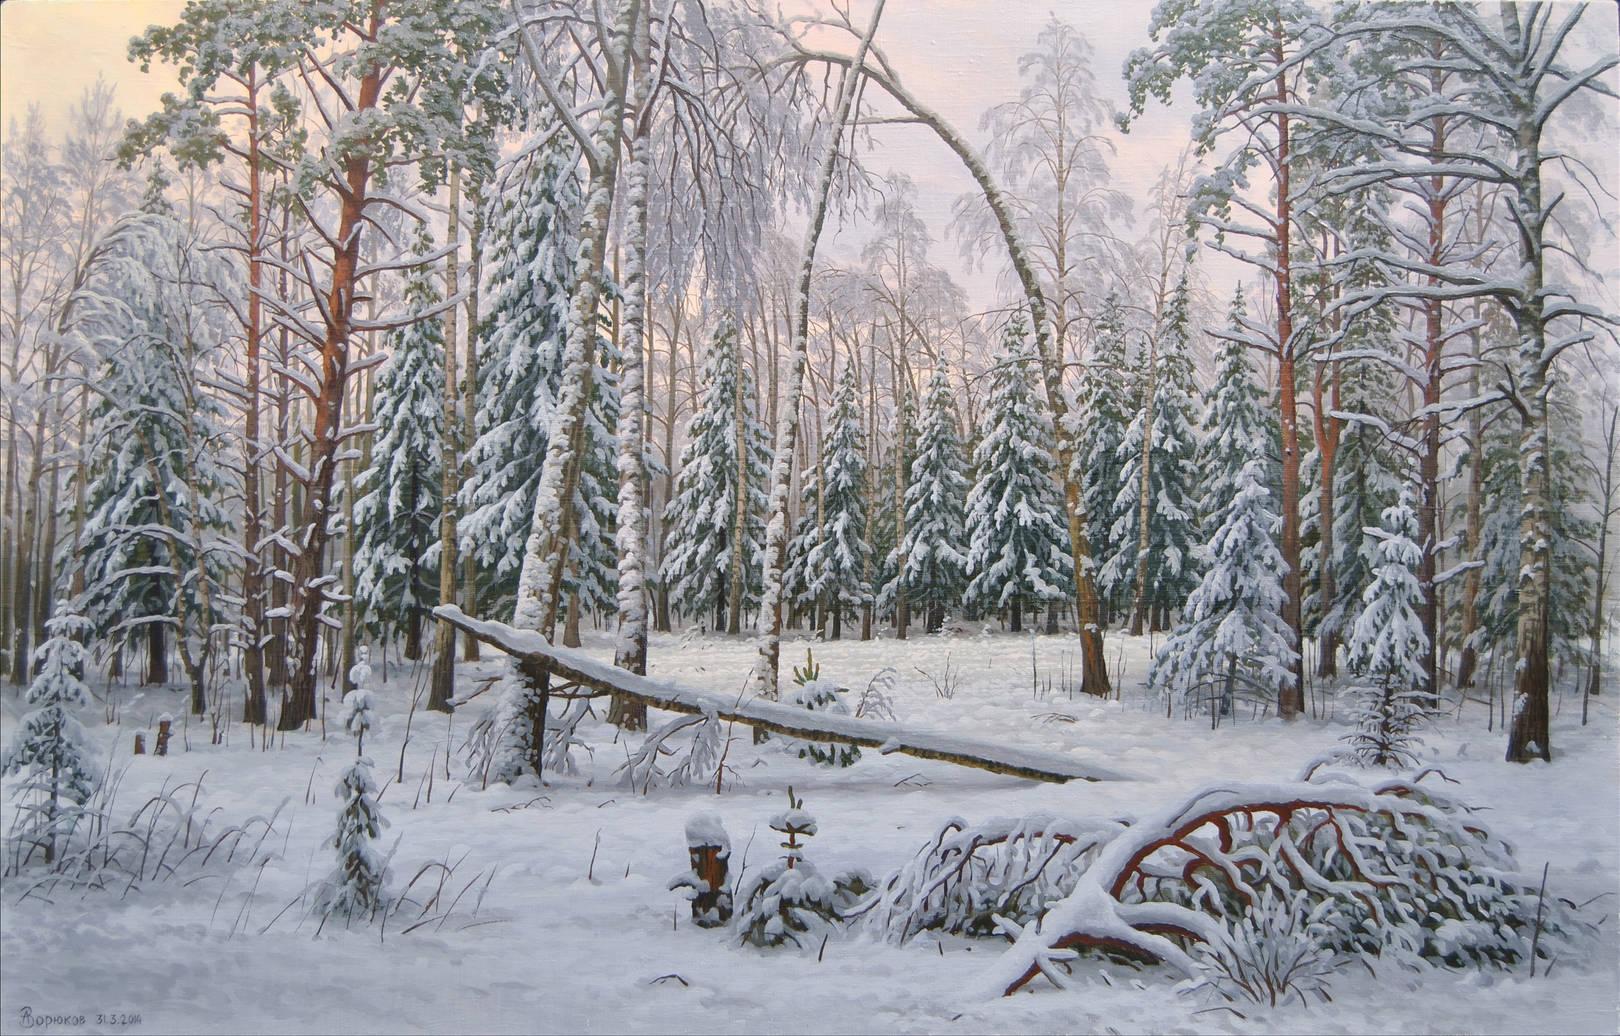 А.ЗОРЮКОВ. Снежный лес. 2014 г.; холст/масло; 80х126 см